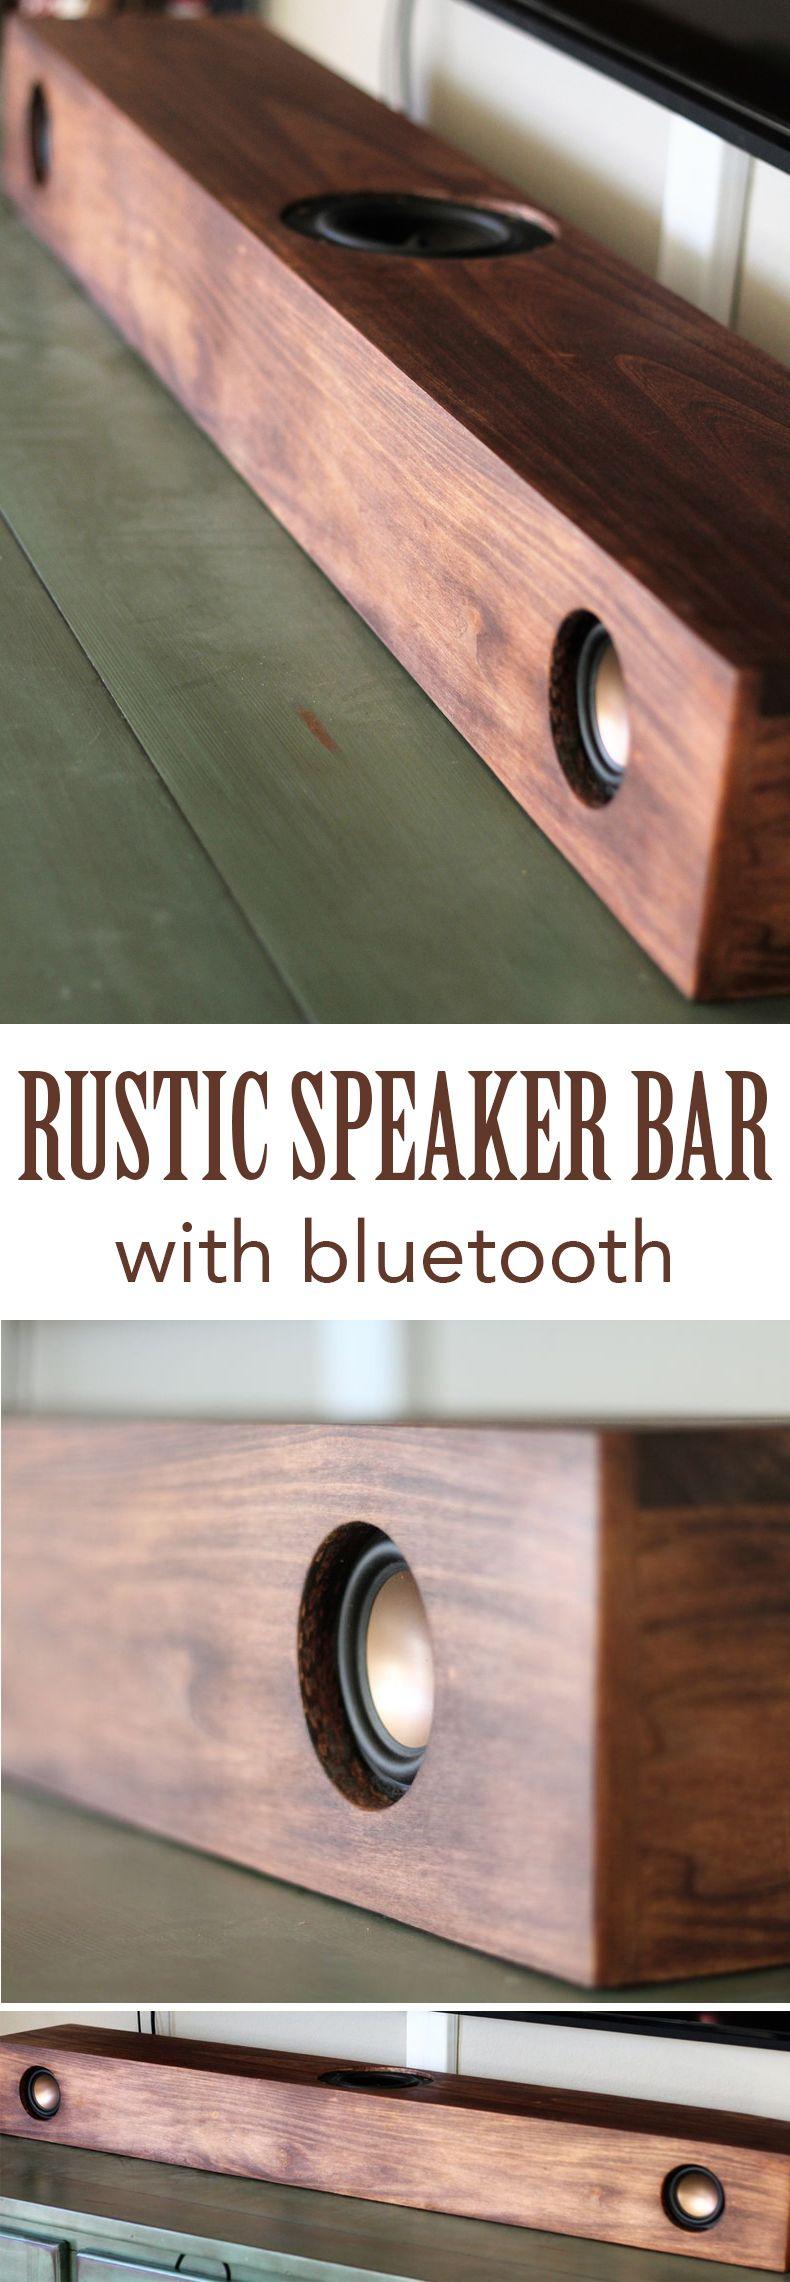 make a stylish speaker bar from scratch